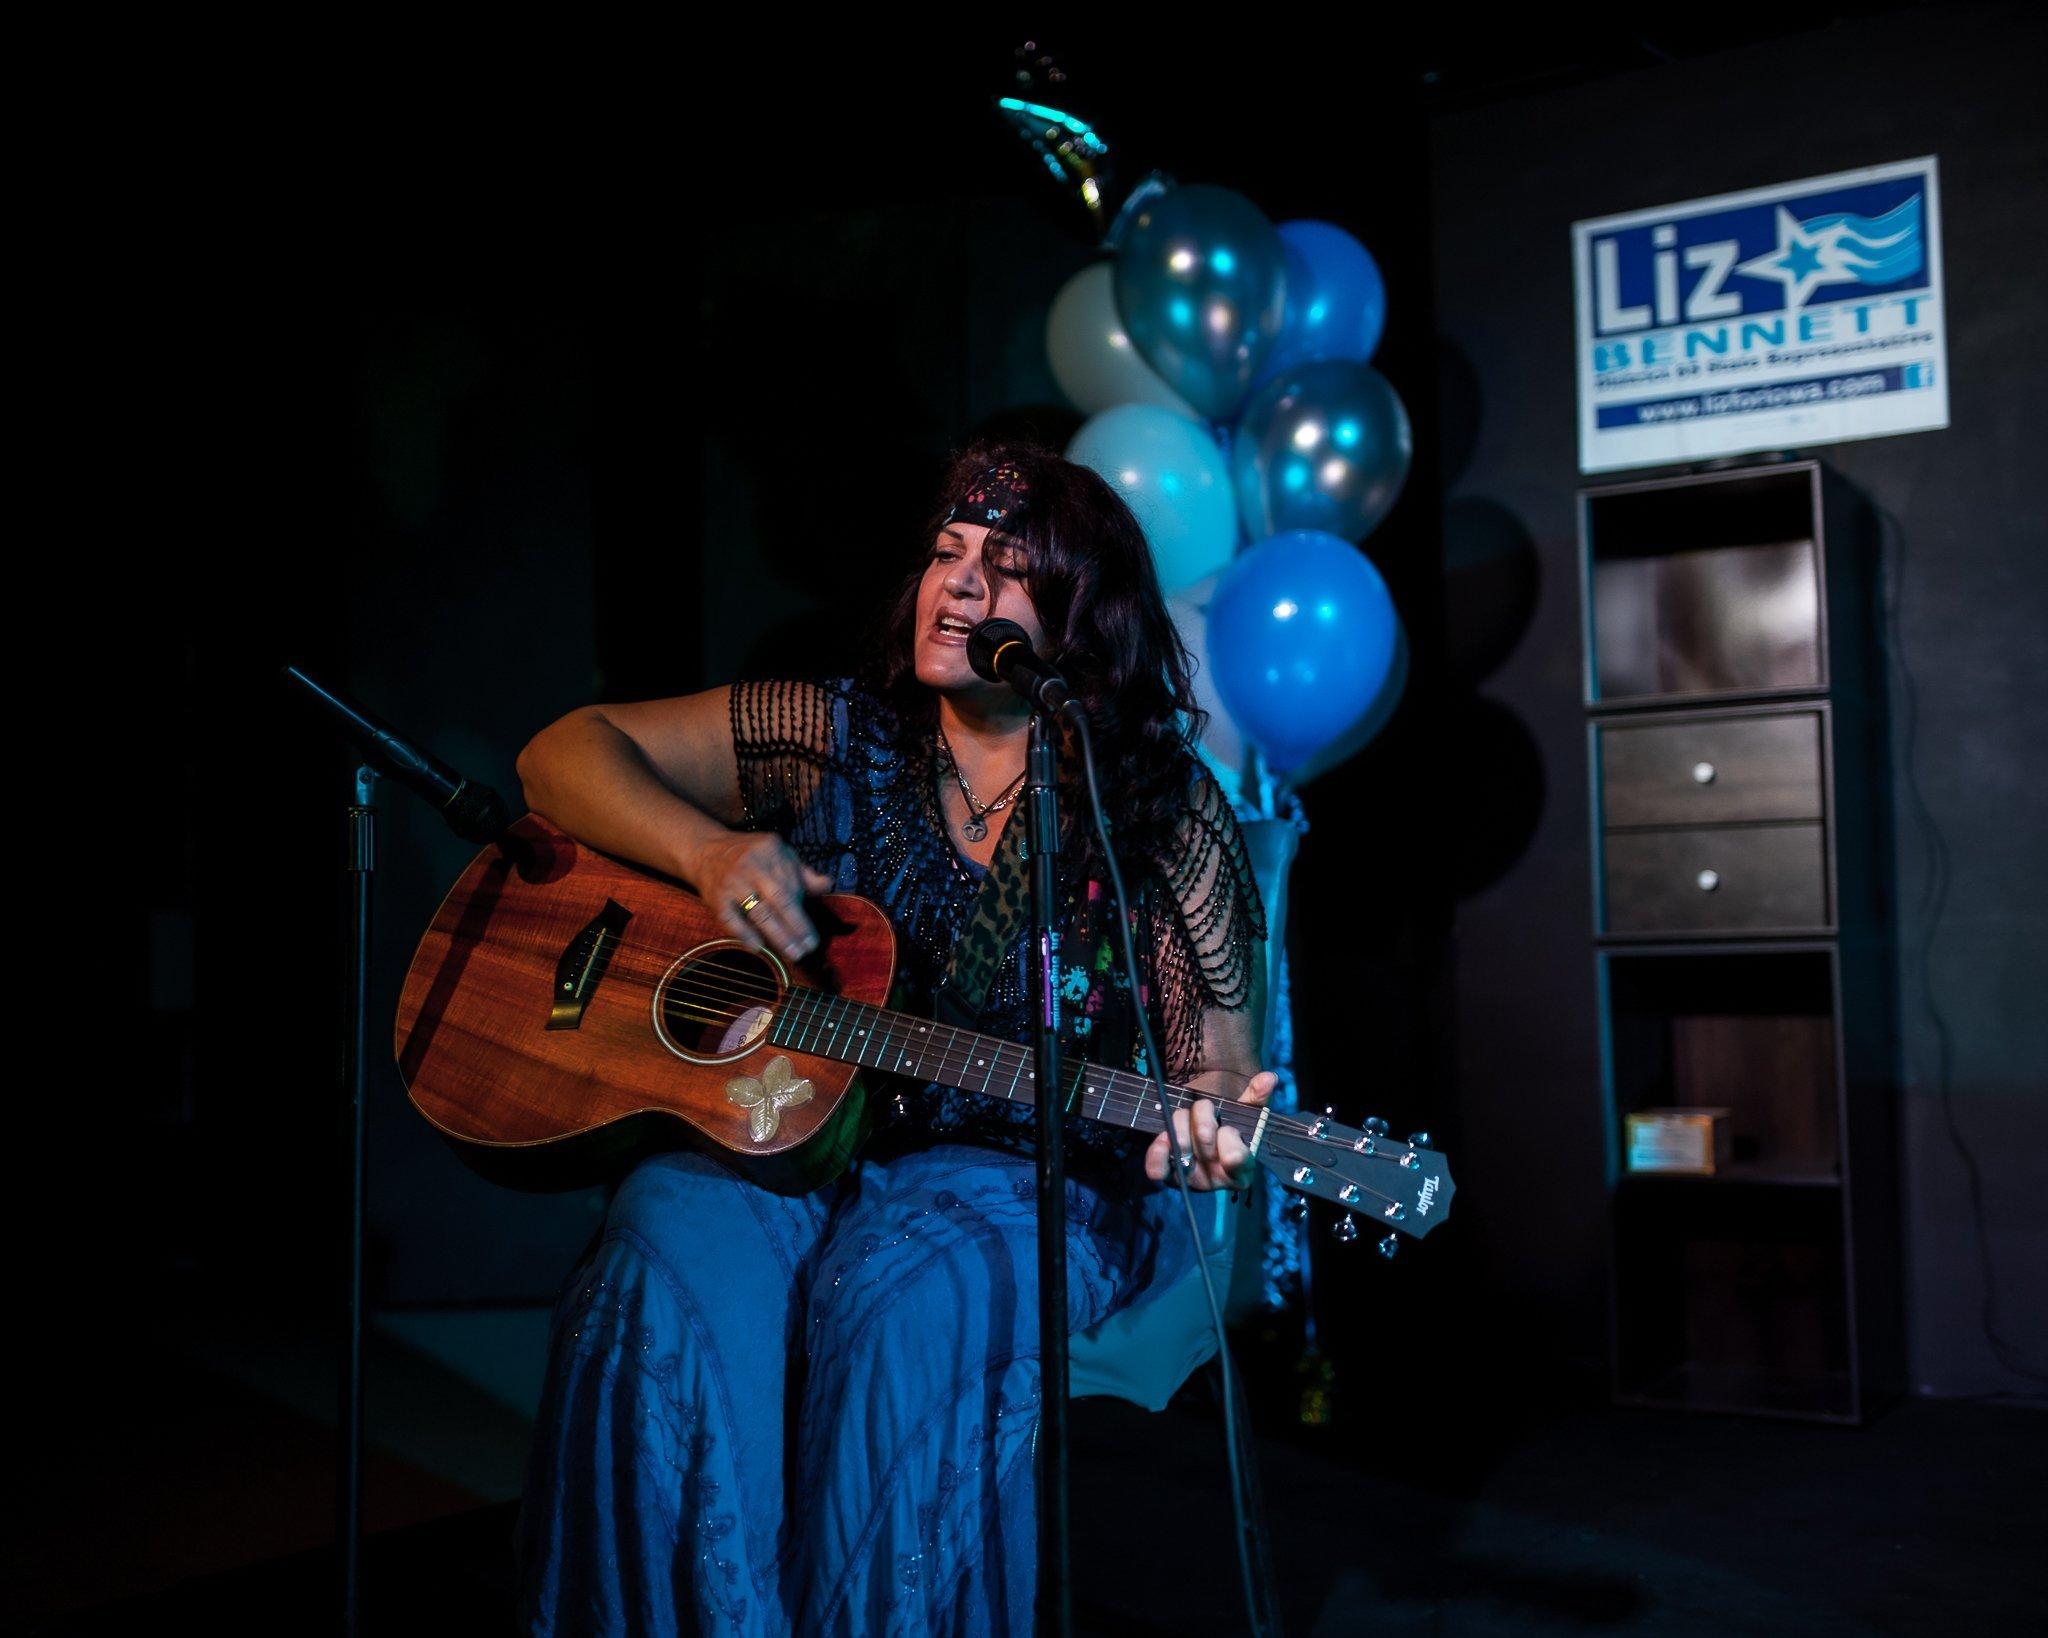 Julie Jules Gordon performing at State Representative Liz Bennett's Celebrity Karaoke Night Fundraiser